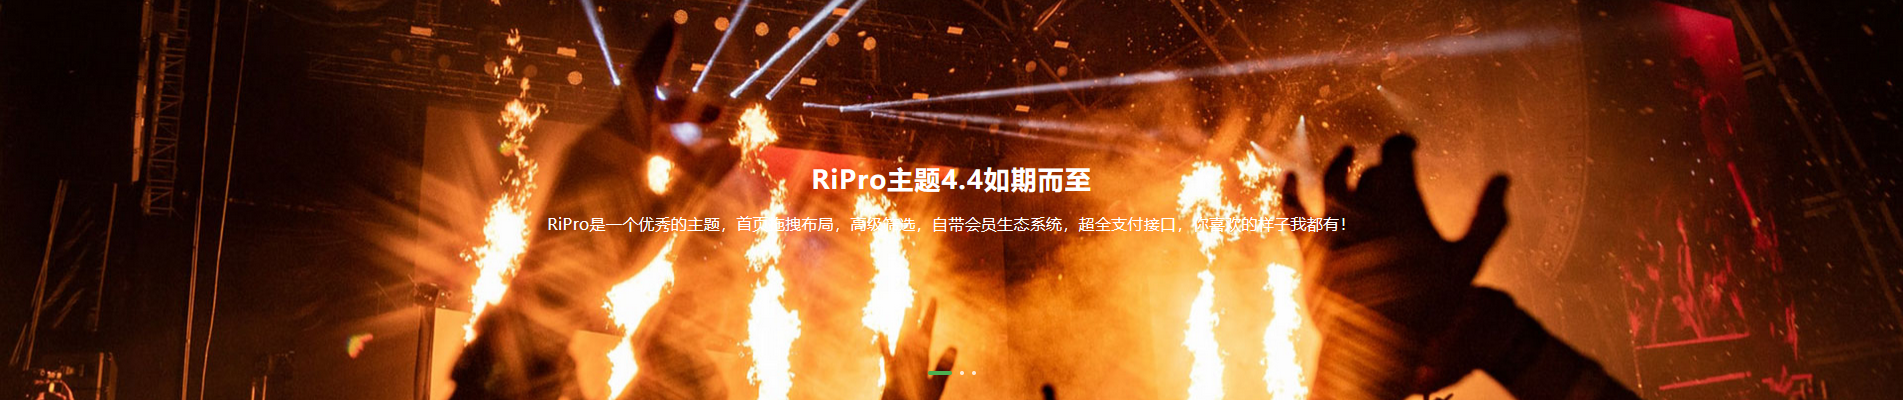 wordpress日主题RiPro4.6主题附主题授权激活版 附授权码